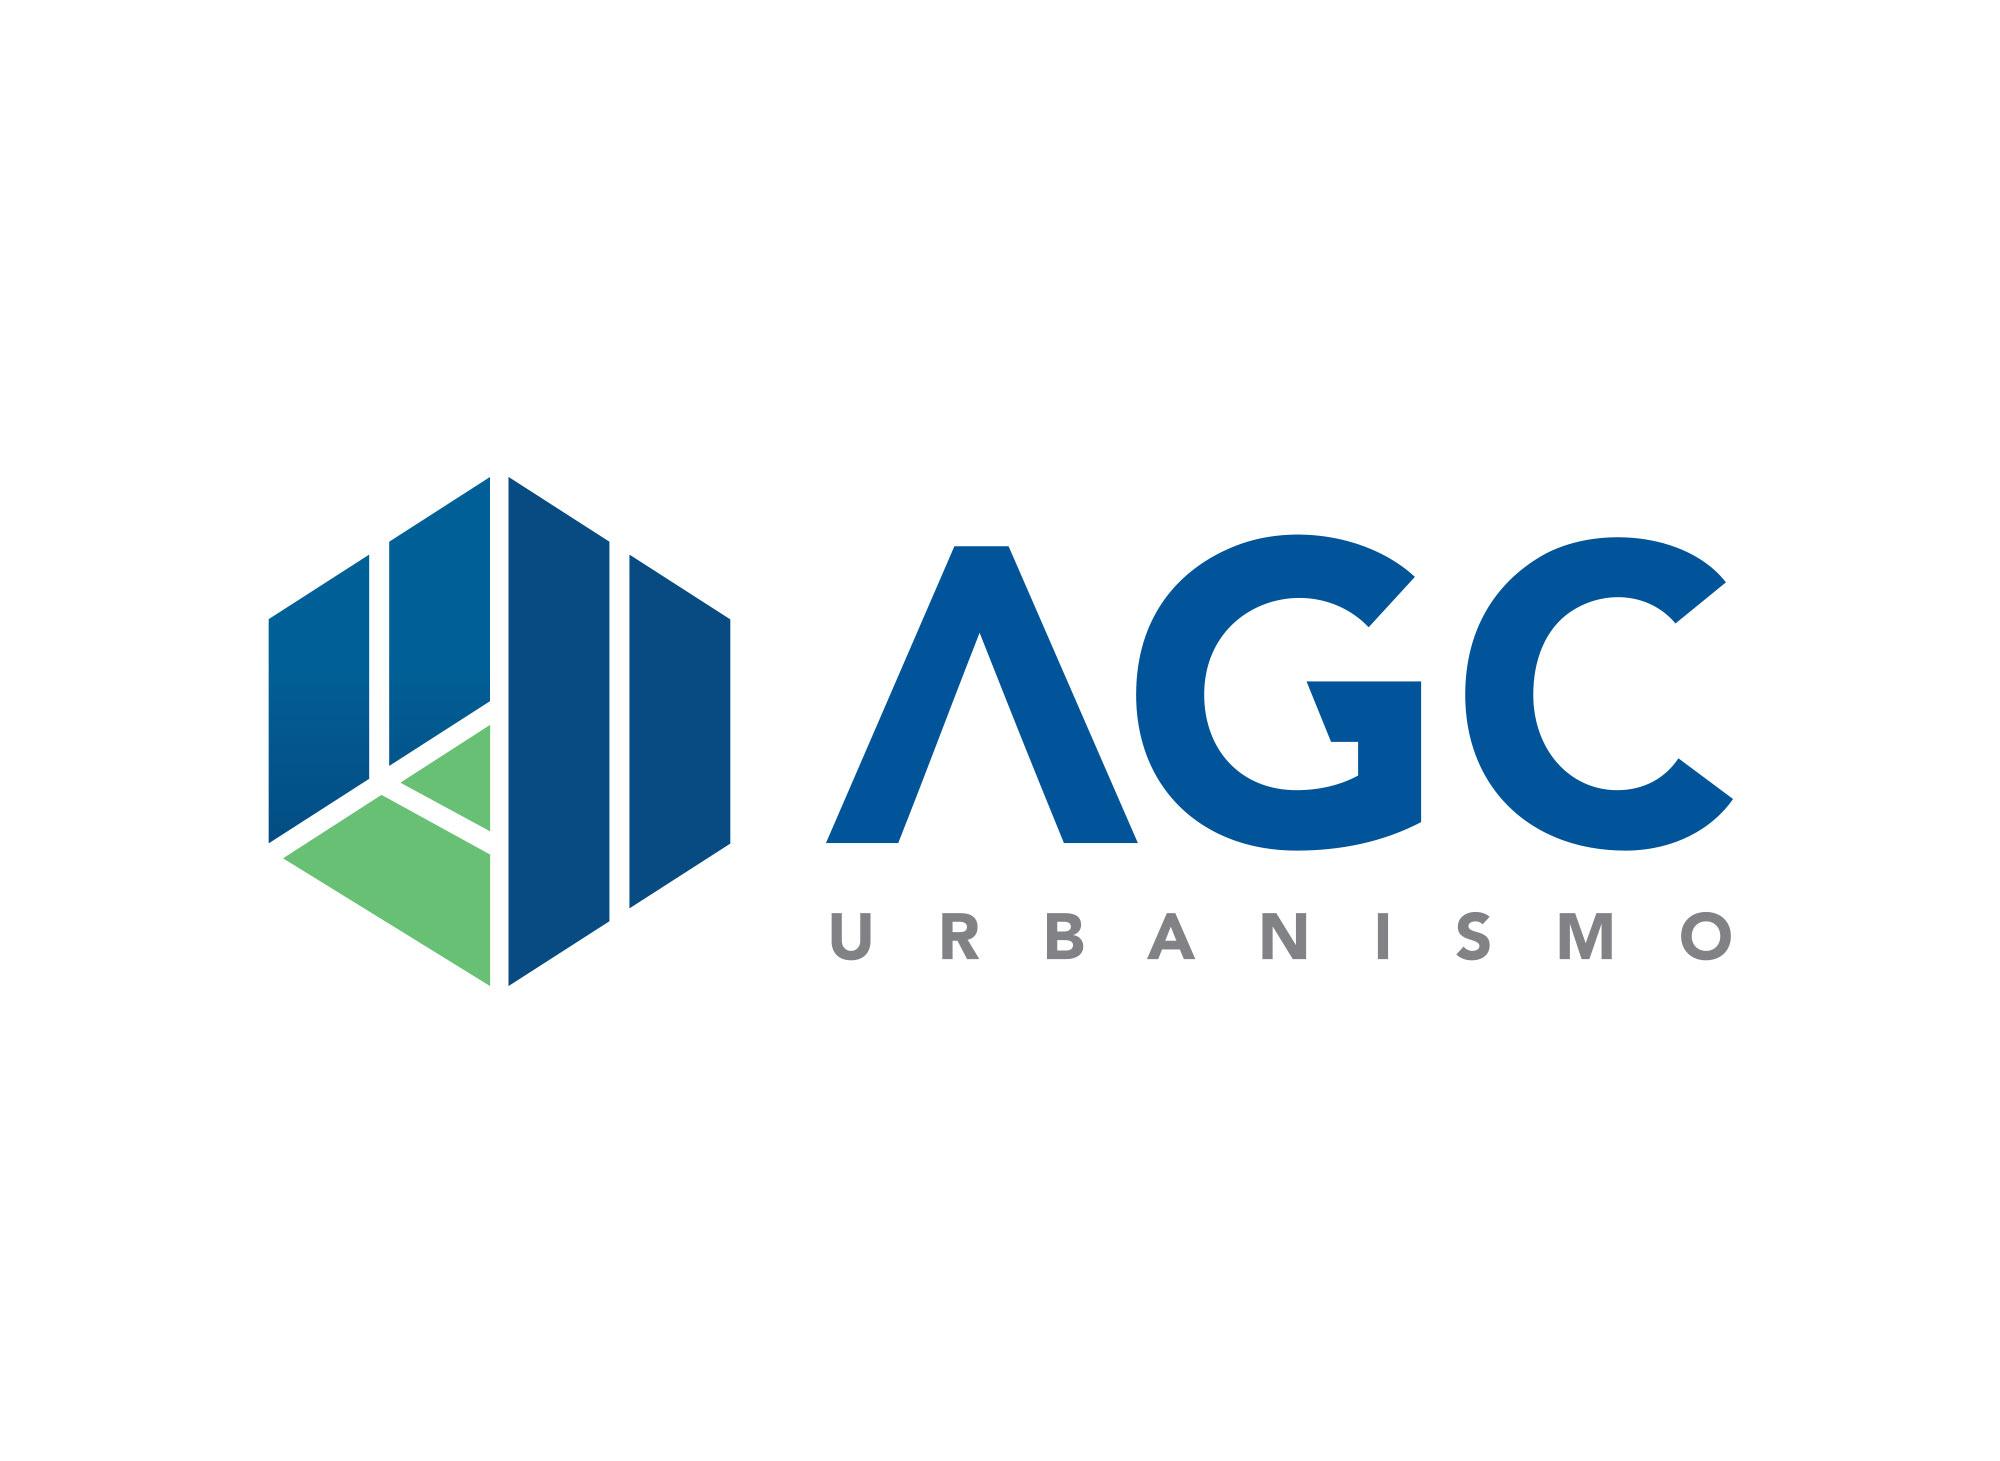 agc-urbanismo-cliente-portfolio-agencia-diretriz-digital-marketing-fortaleza